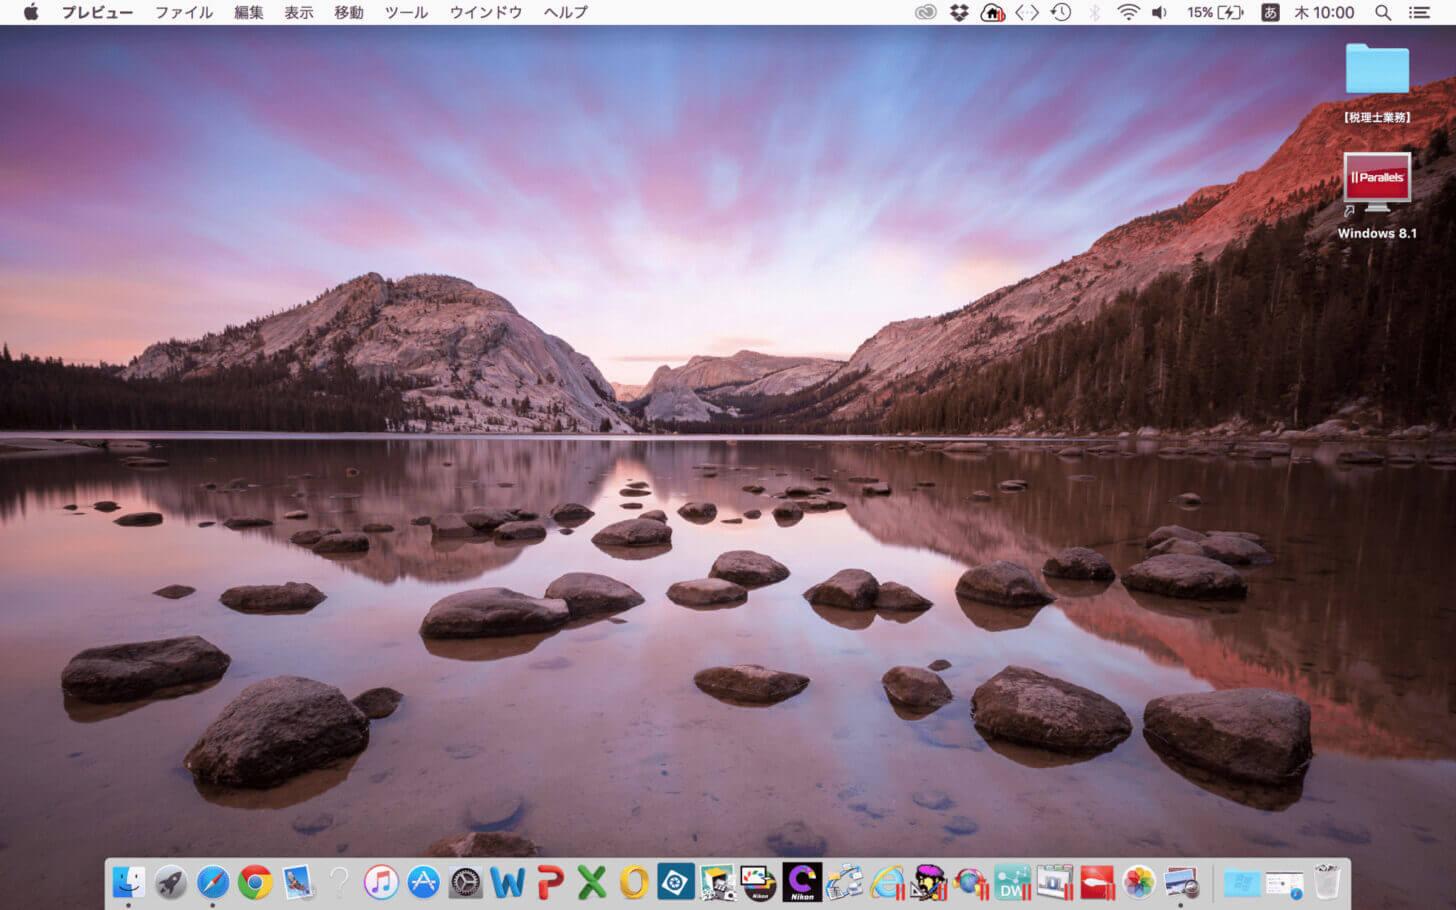 Mac OS X El Capitanのデスクトップ画面